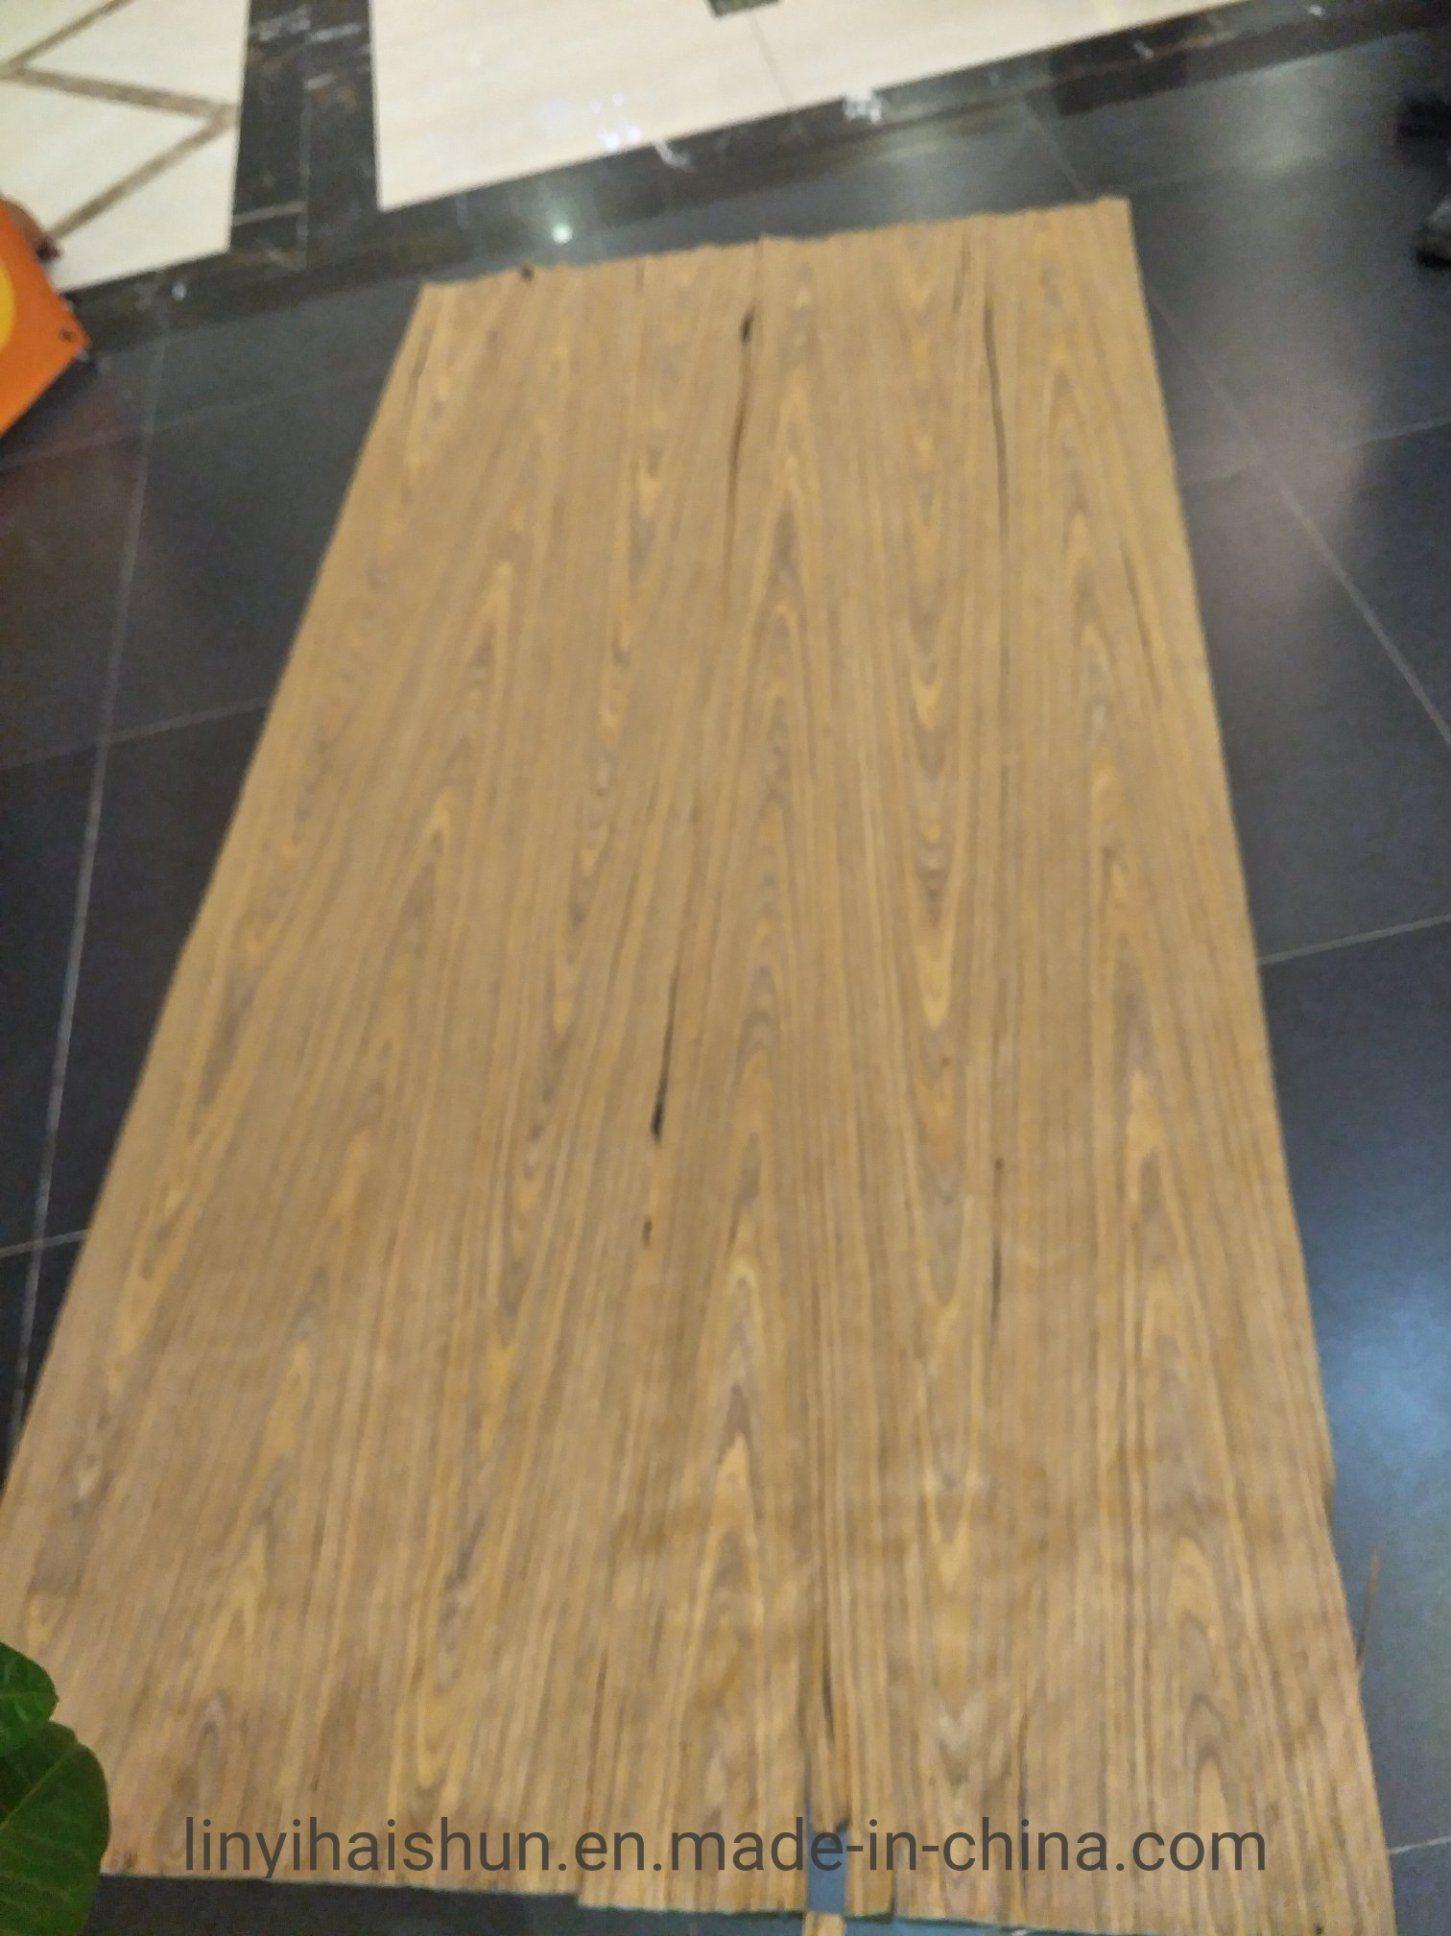 China Wood Veneer Tape Technical Veneer Golden Teak Veneer China Technical Veneer Golden Teak Veneer